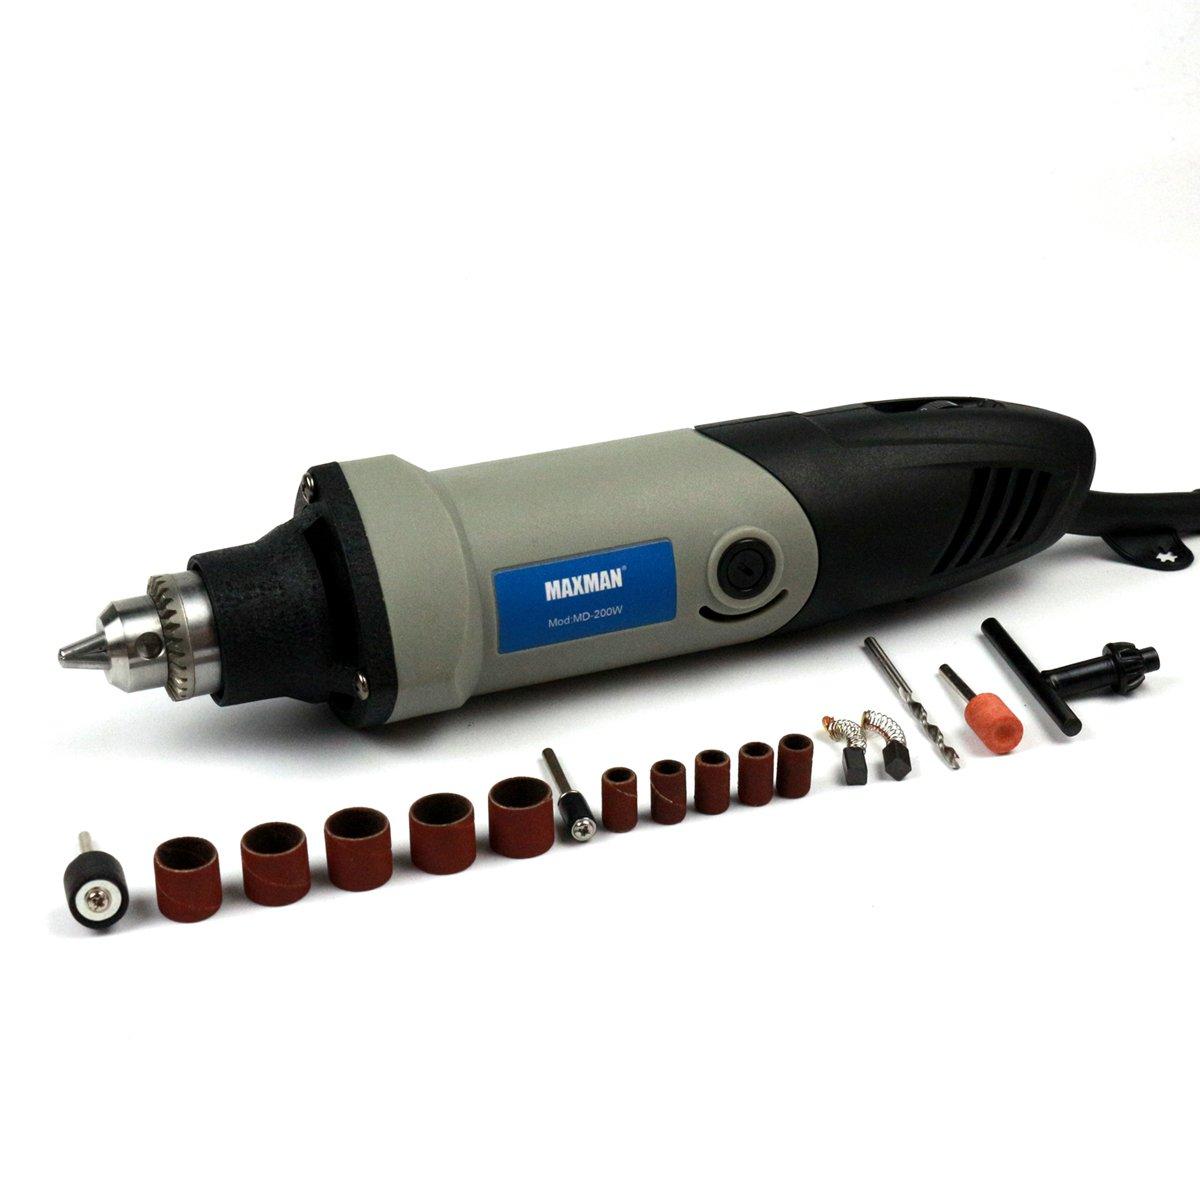 MAXMAN Electric Mini Die Grinder 110V 200W 6-grade Variable Speed Rotary Tool Multifunctional DIY Power Tools